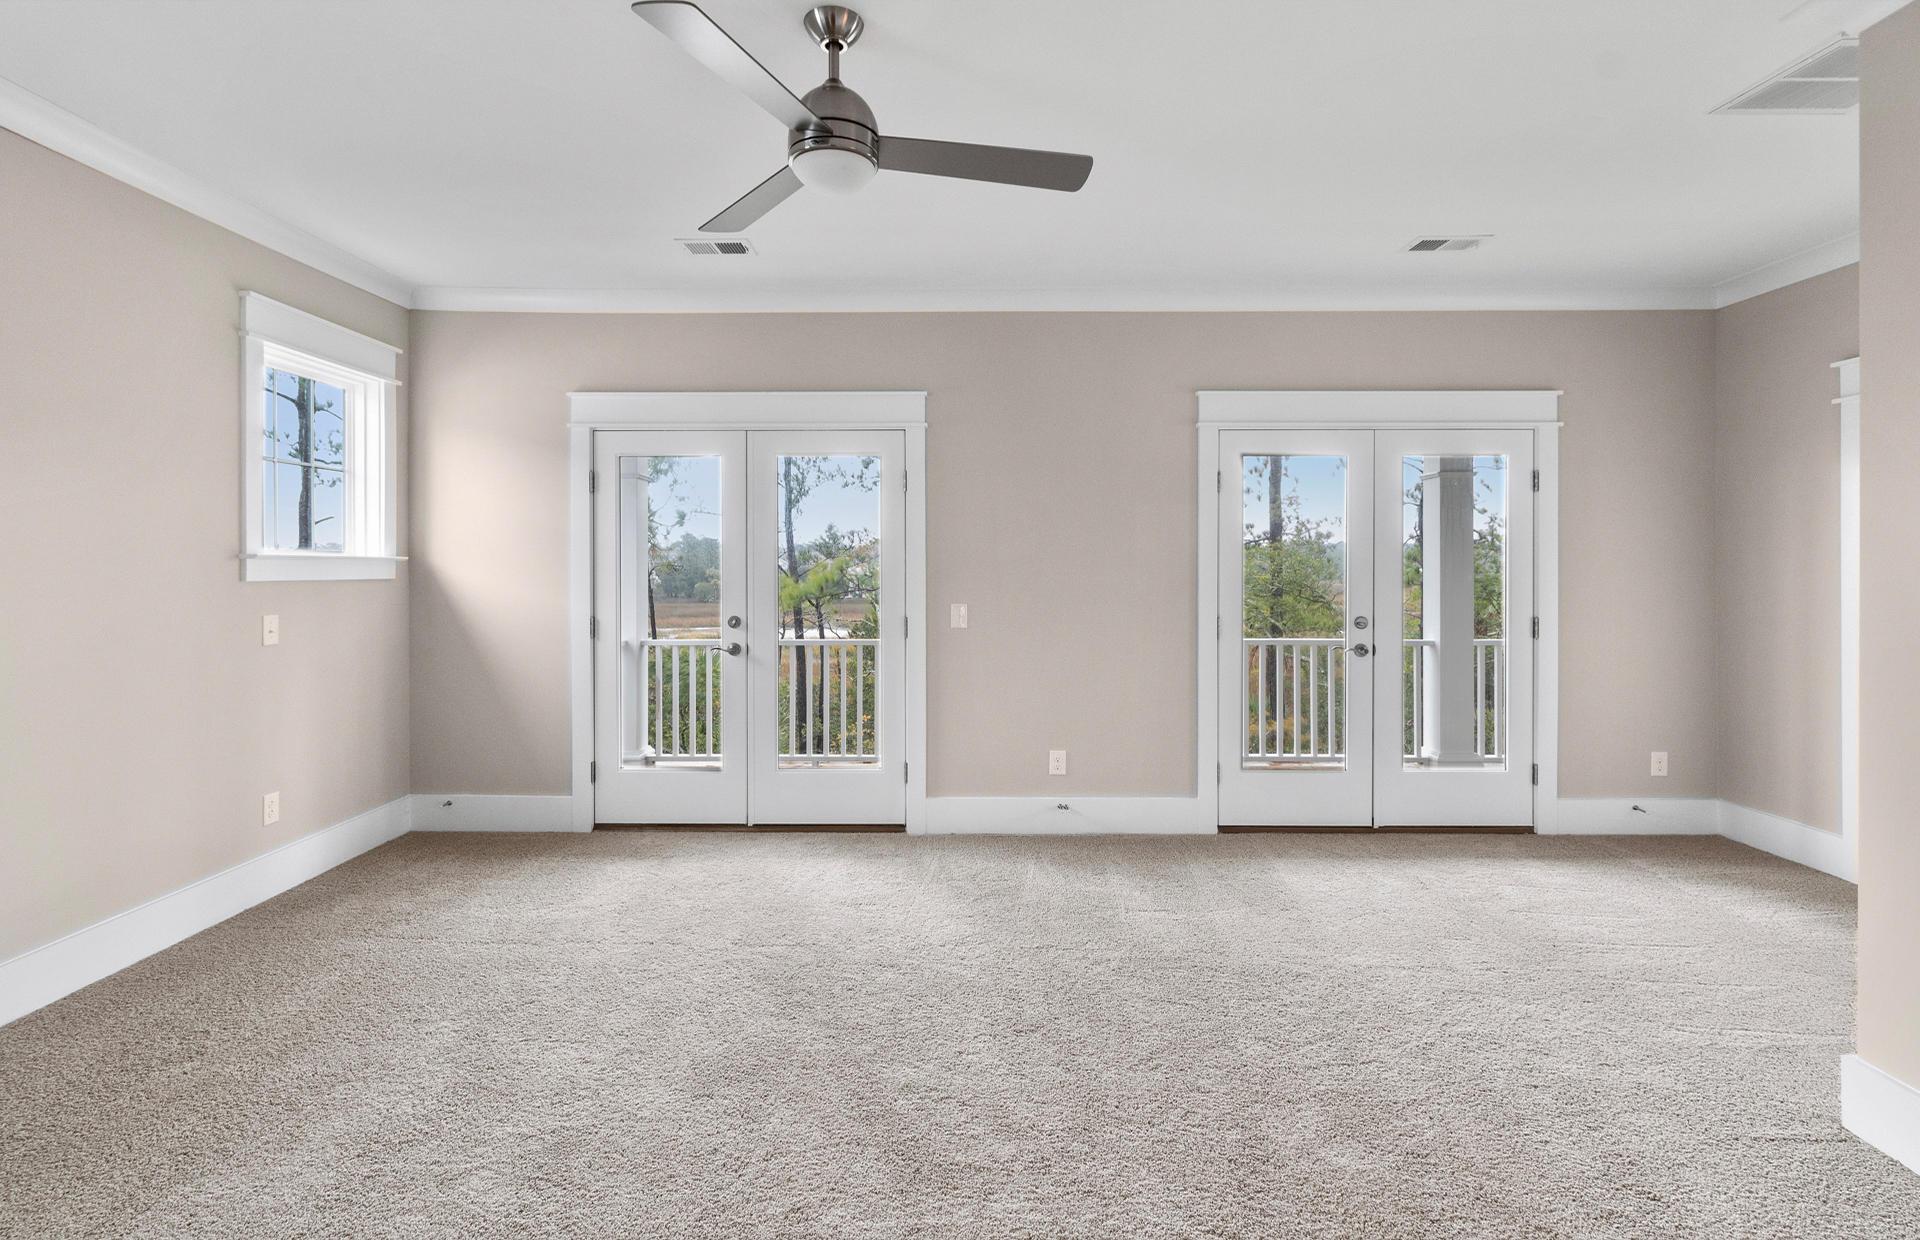 Dunes West Homes For Sale - 2320 Bucktail, Mount Pleasant, SC - 11